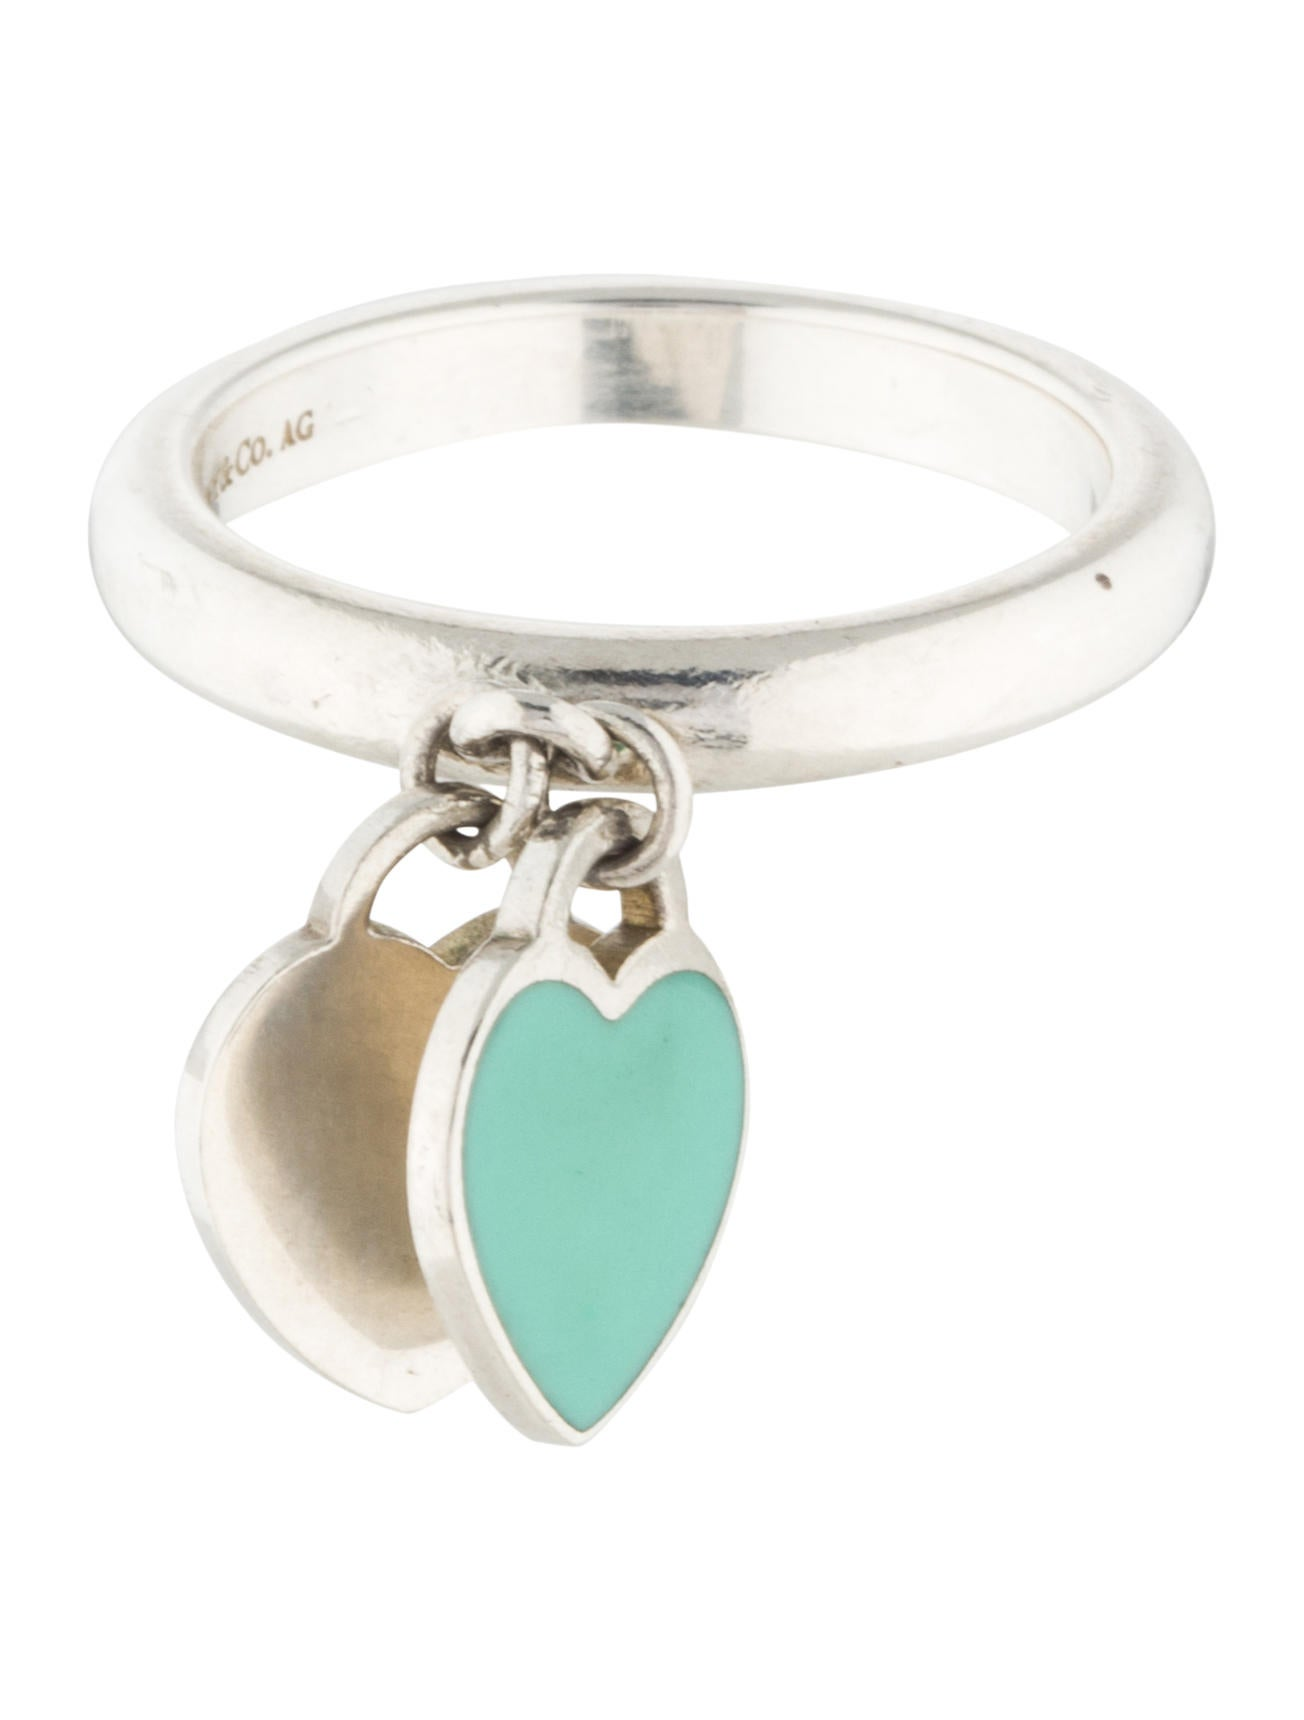 Tiffany co mini double heart ring rings tif54358 for Heart ring box